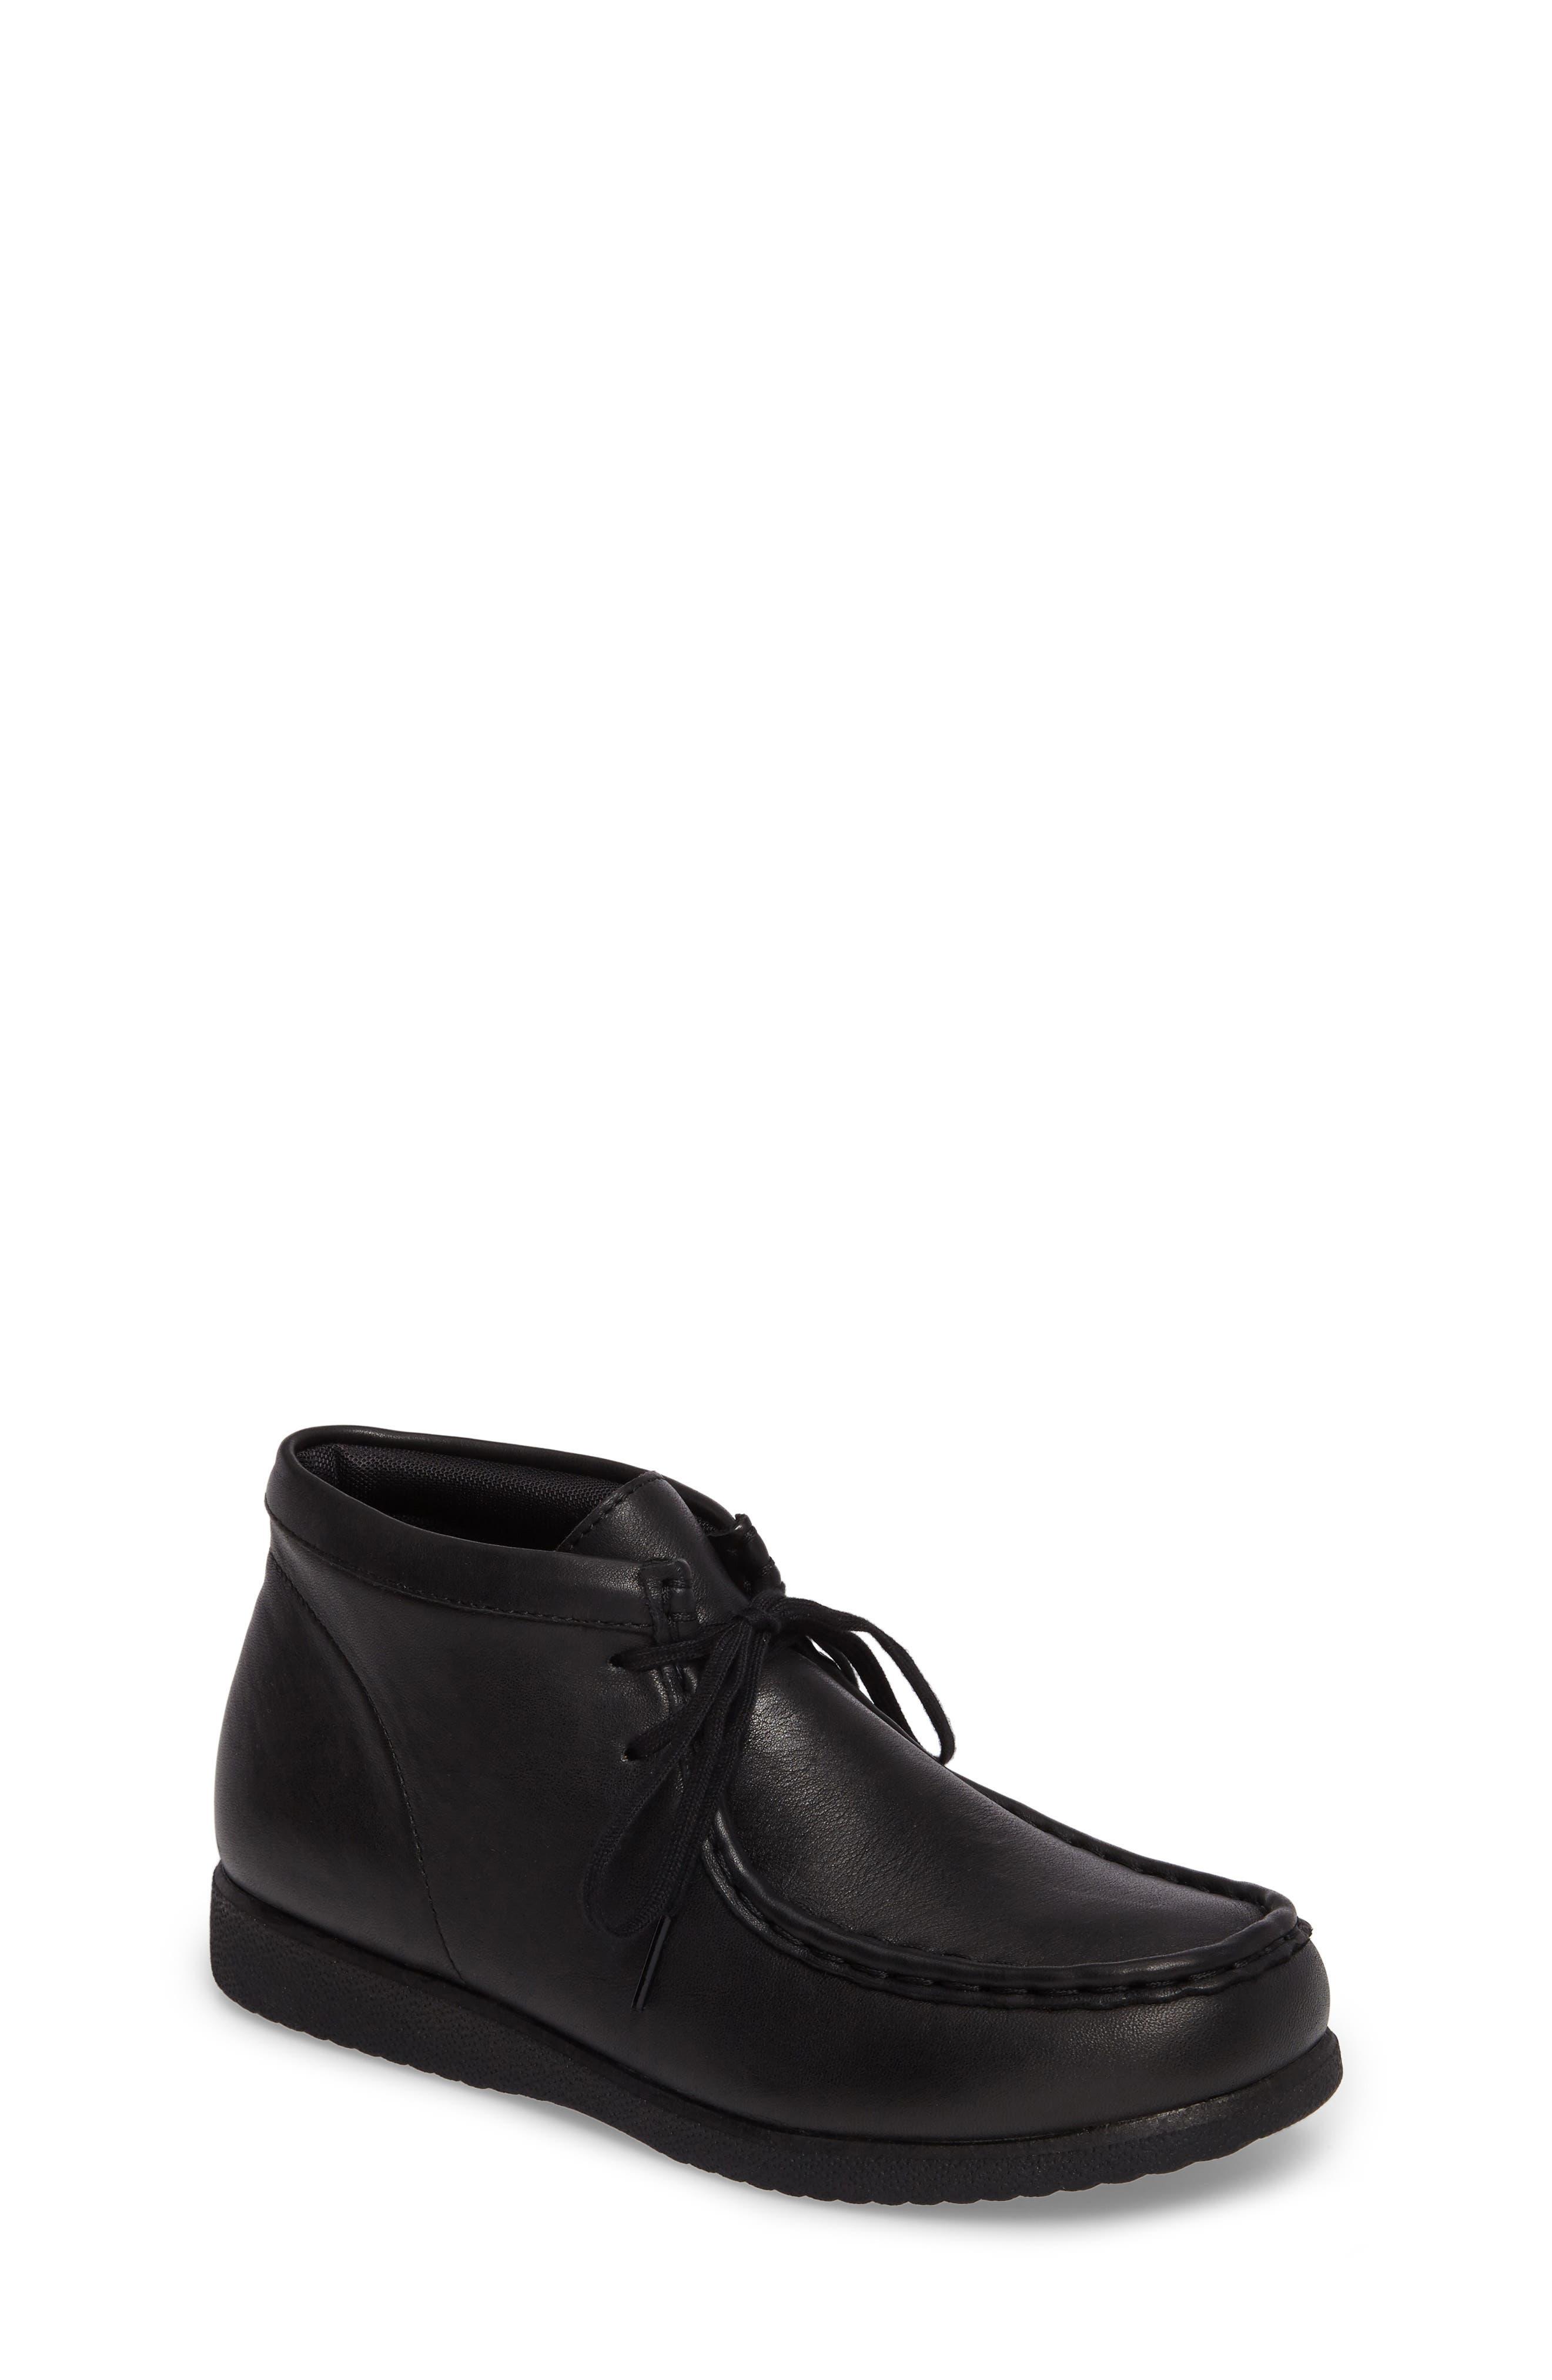 HUSH PUPPIES<SUP>®</SUP> Bridgeport III Chukka Boot, Main, color, BLACK LEATHER